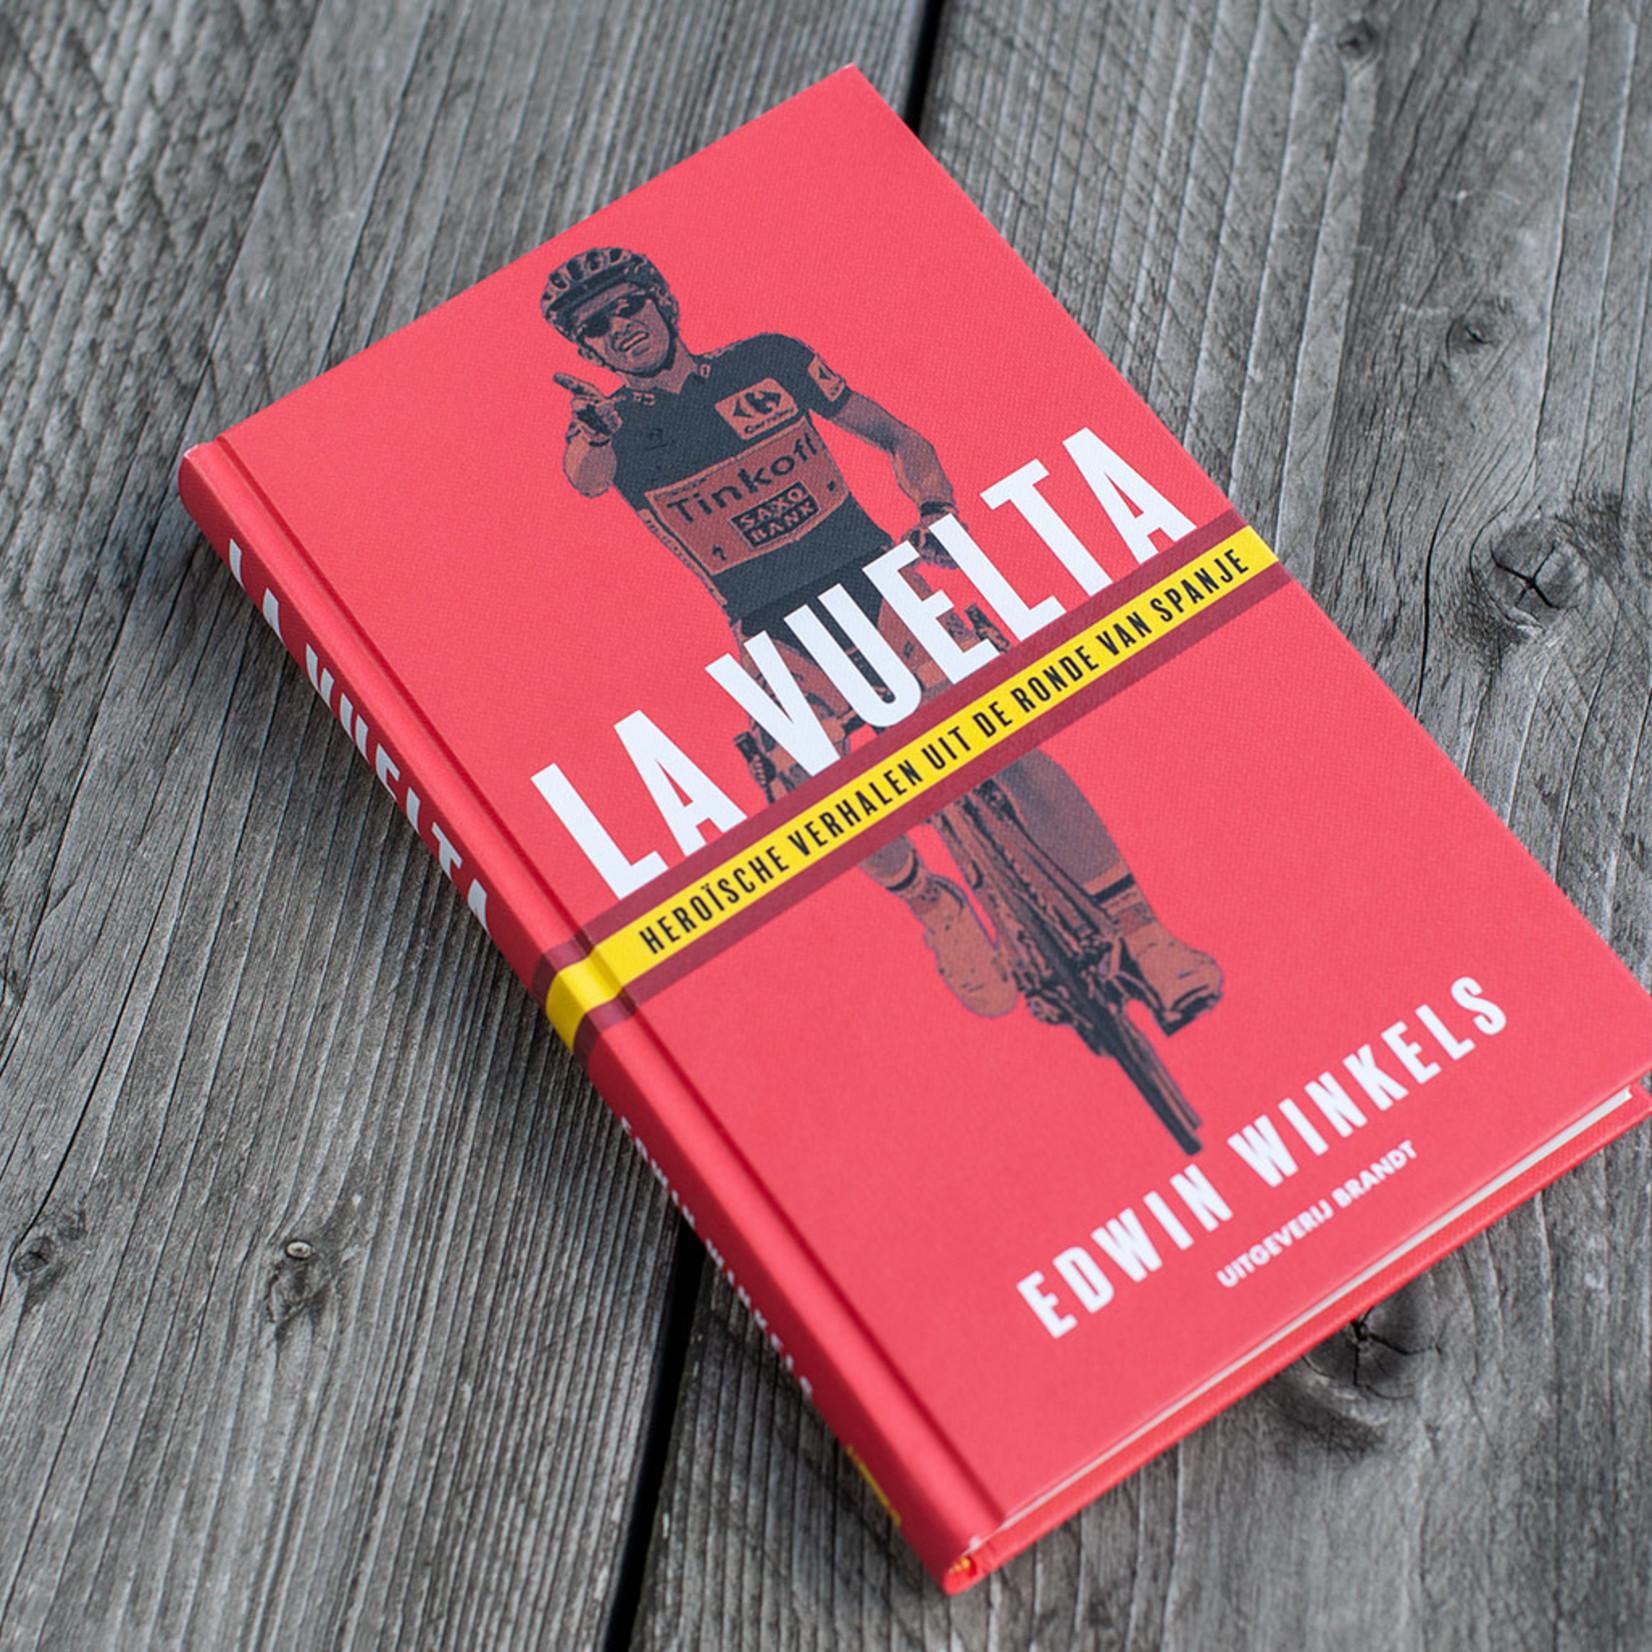 Book 'La Vuelta'